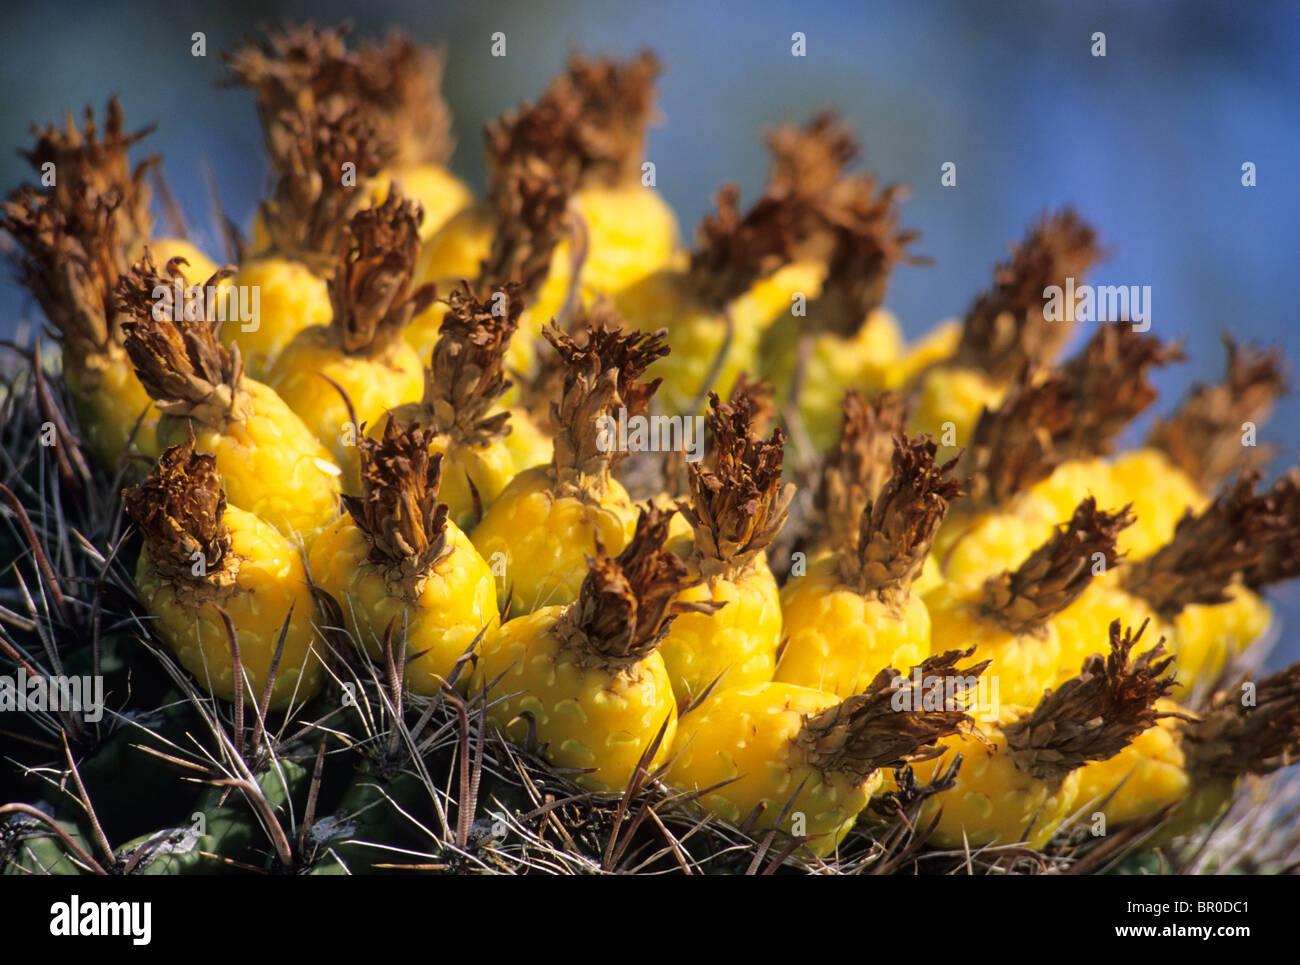 Flowering Barrel Cactus, USA. - Stock Image